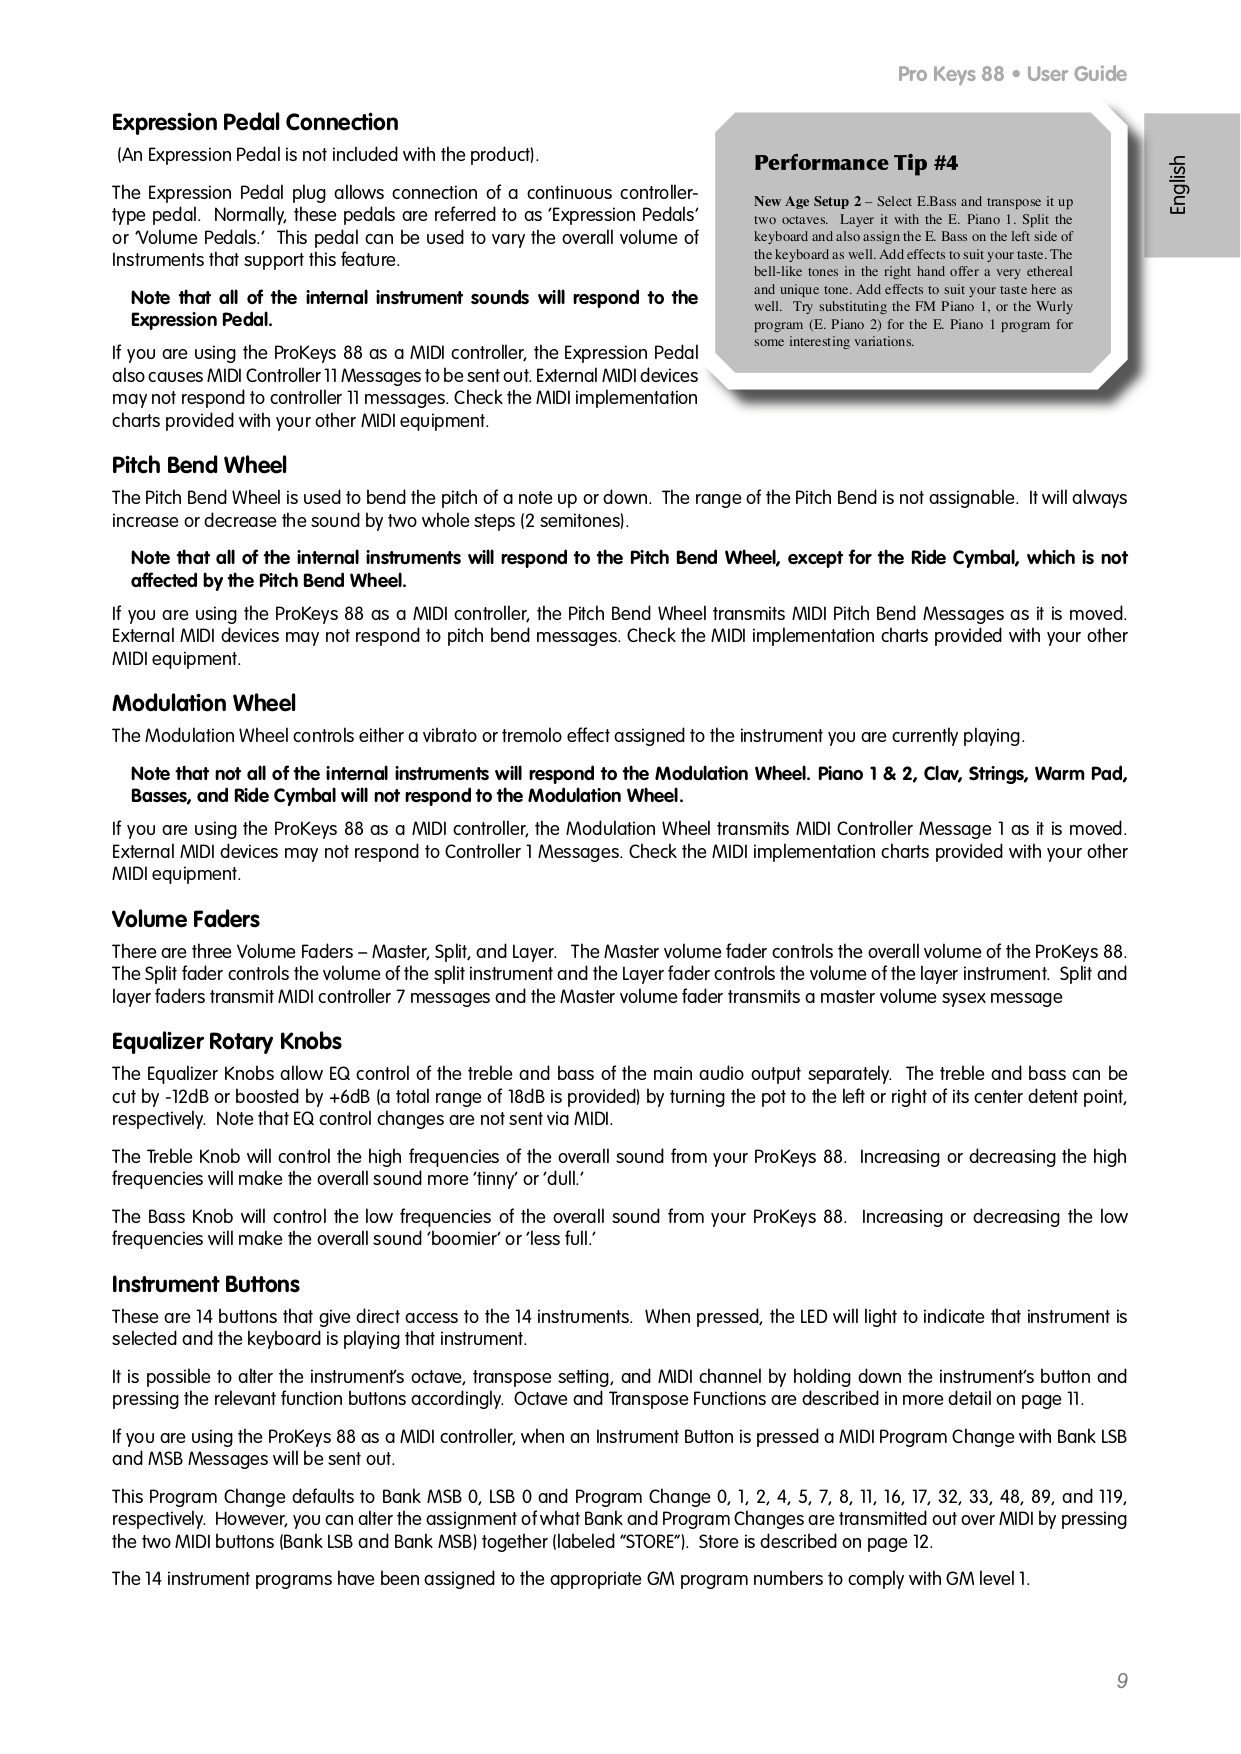 PDF manual for M-Audio Music Keyboard ProKeys 88sx